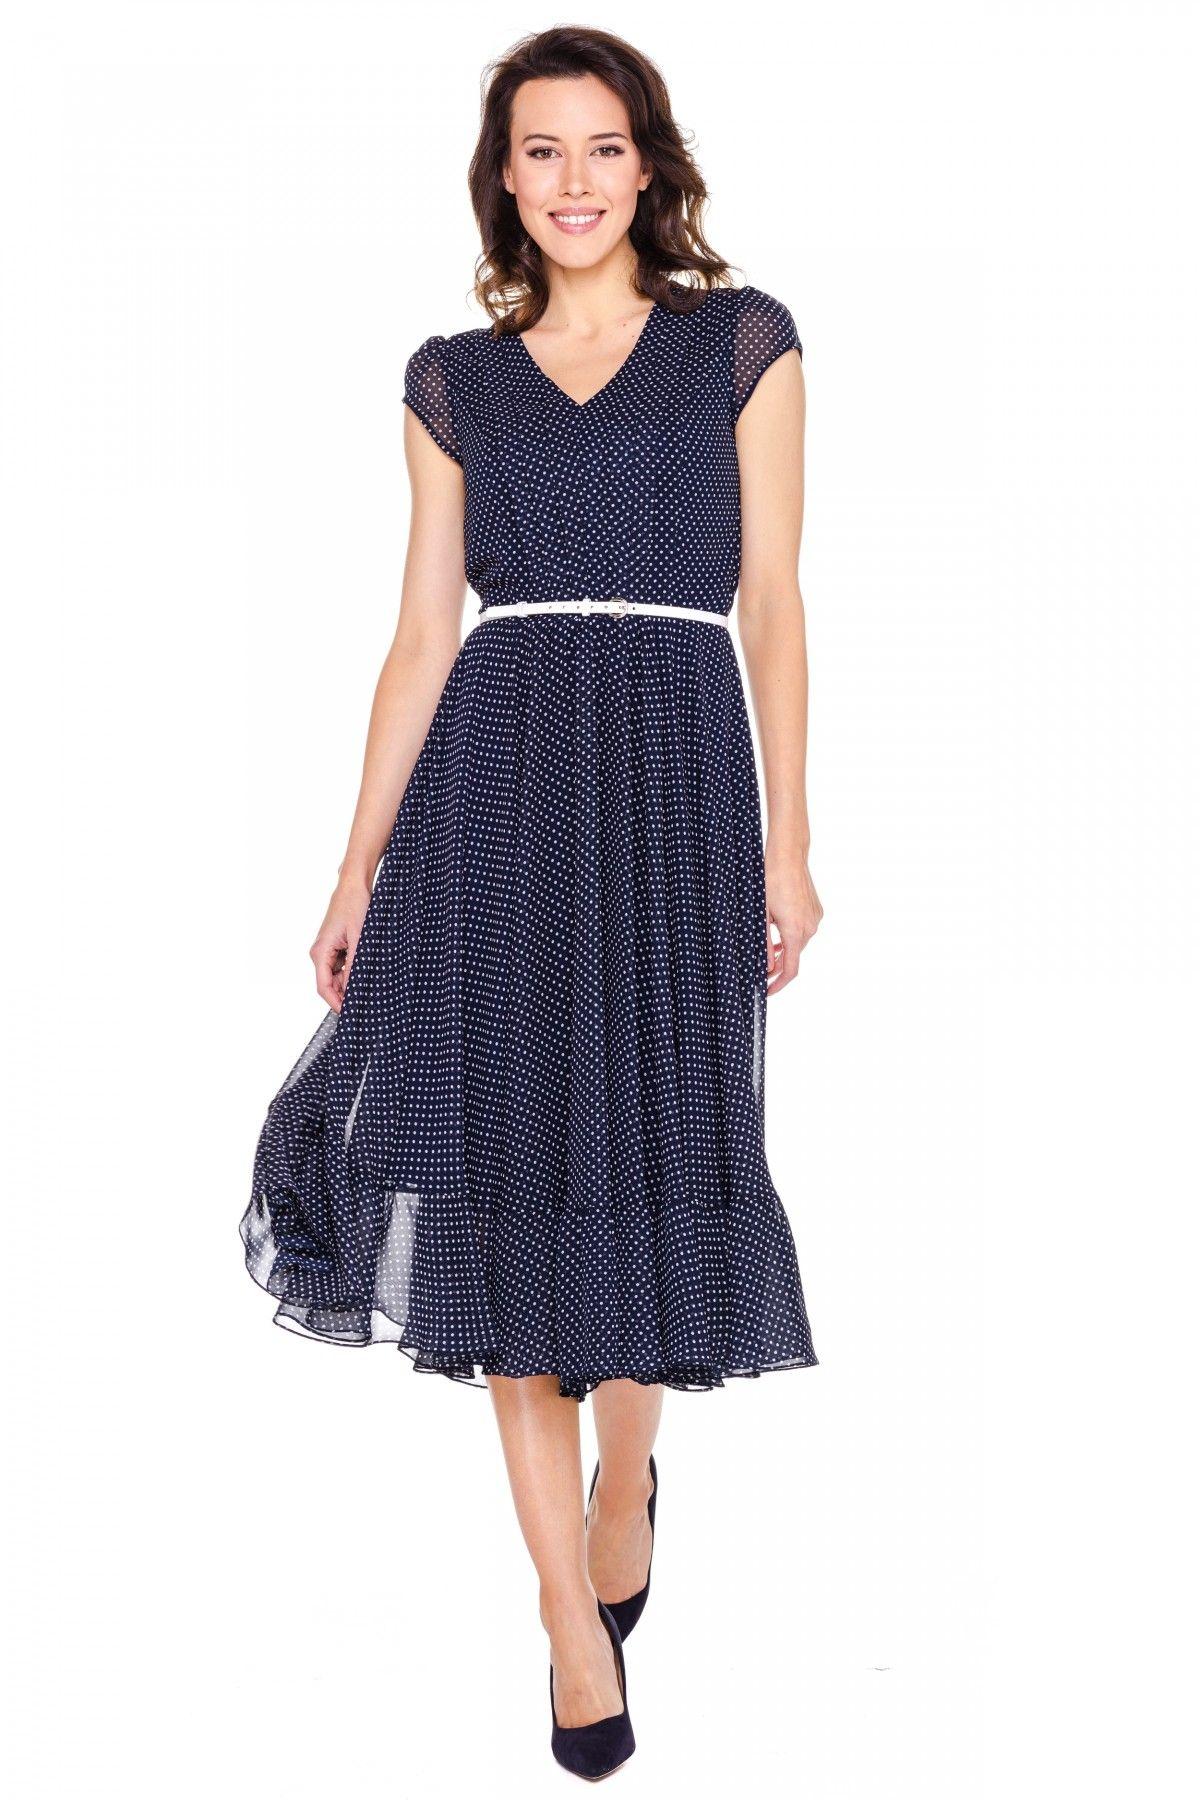 fd3dc8d76d Granatowa sukienka w białe groszki - L ame de Femme - 124582 ...